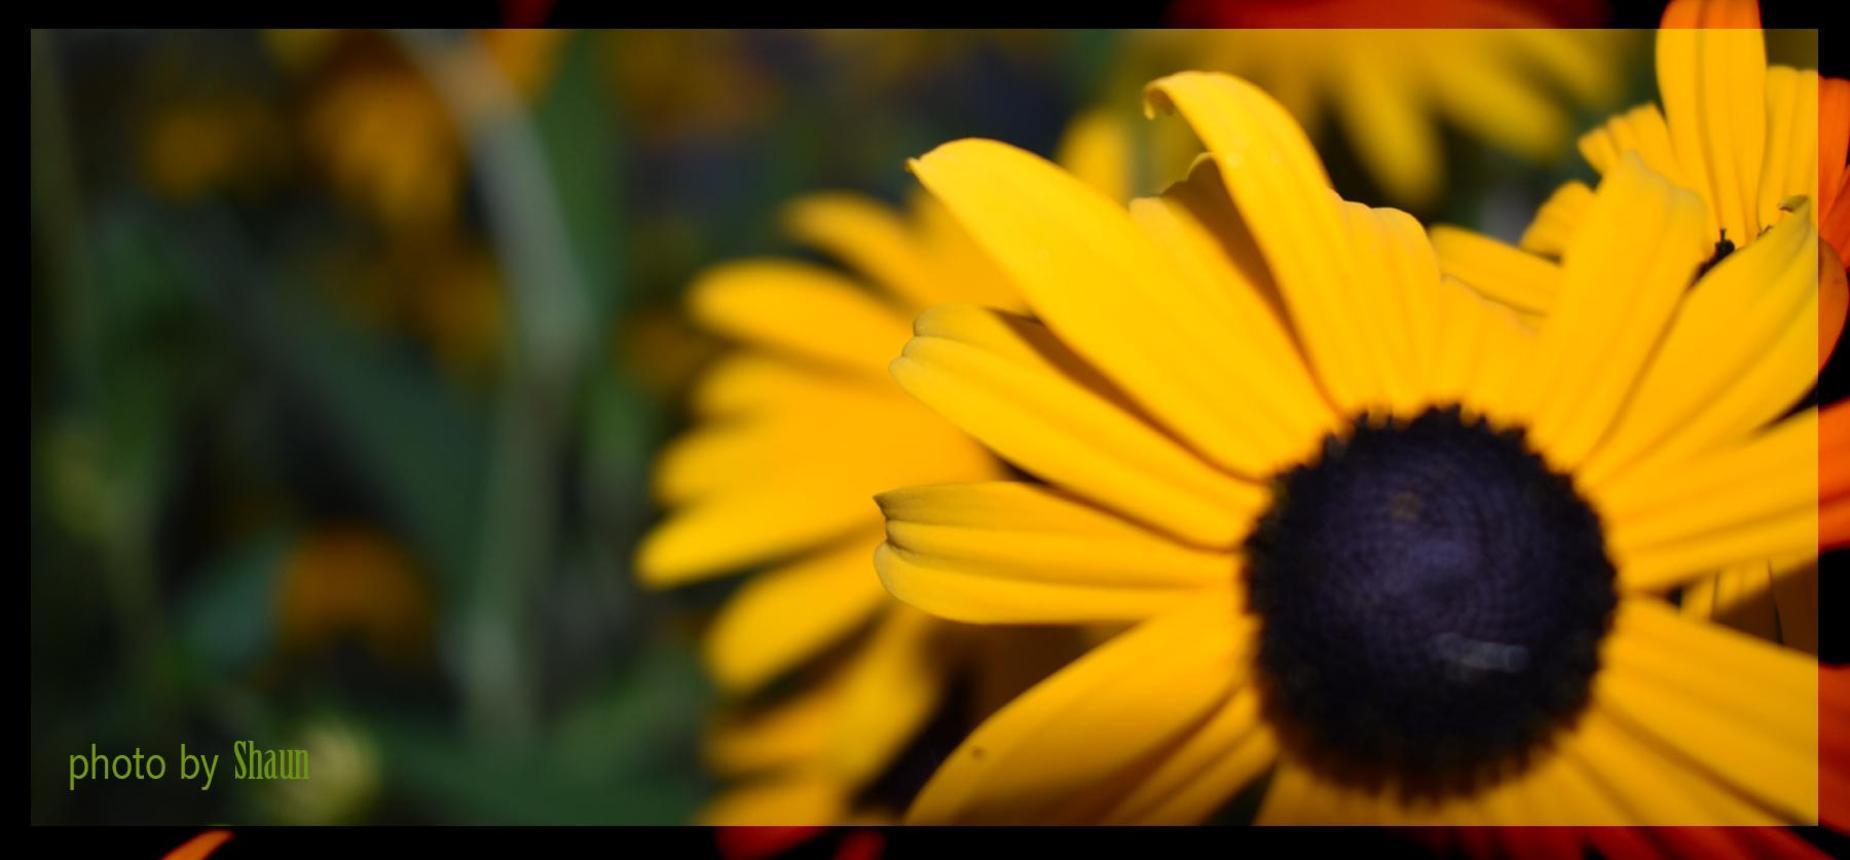 Close up photo of a black eyed susan flower